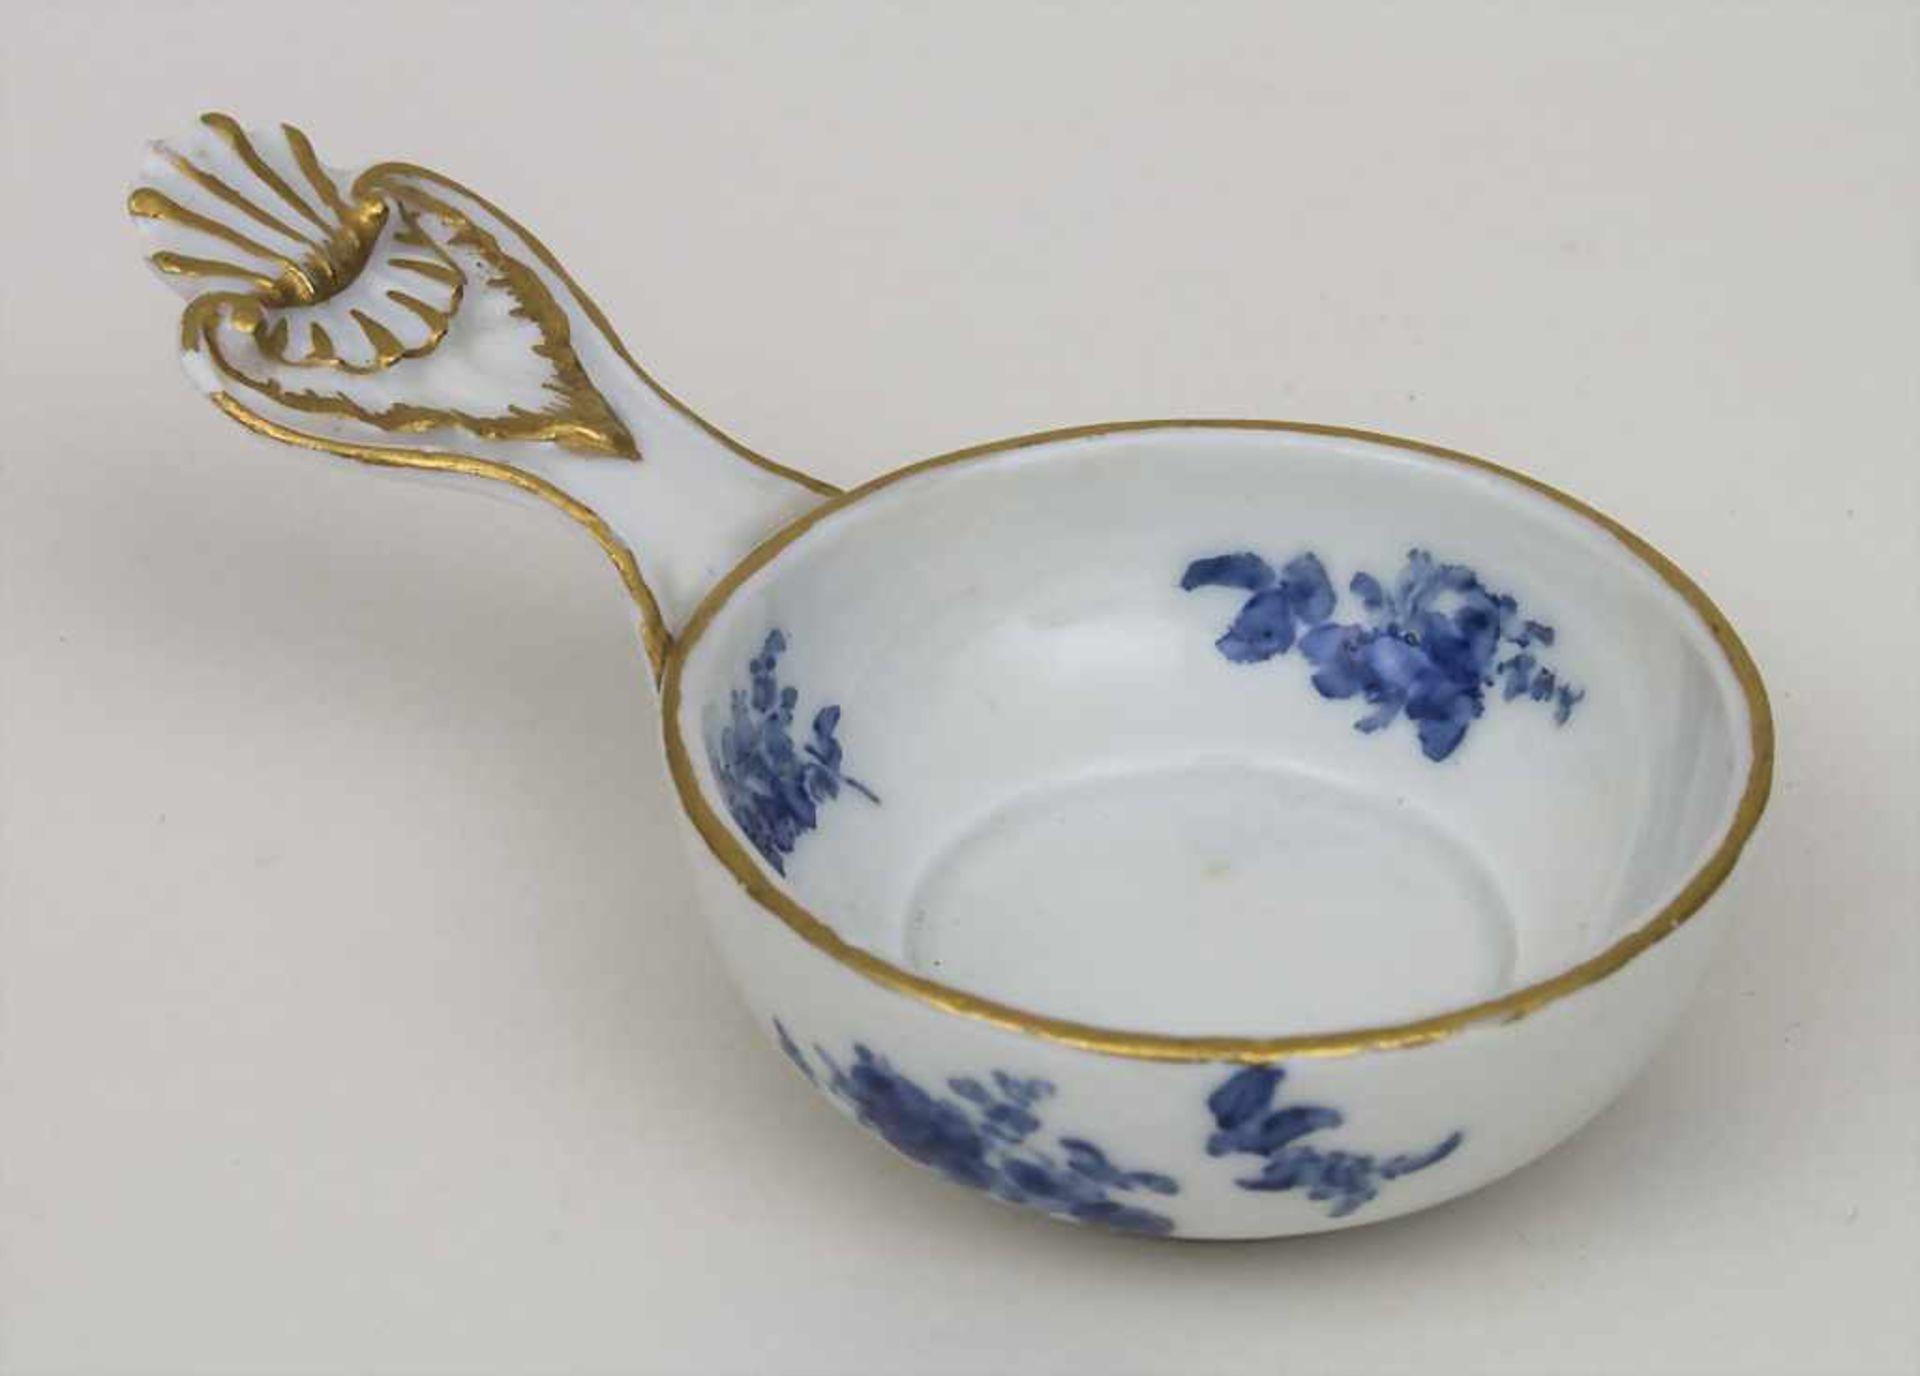 Kleines Henkelgefäß / A small dish with handle, Meissen, Anfang 19. Jh. Material: Porzellan,